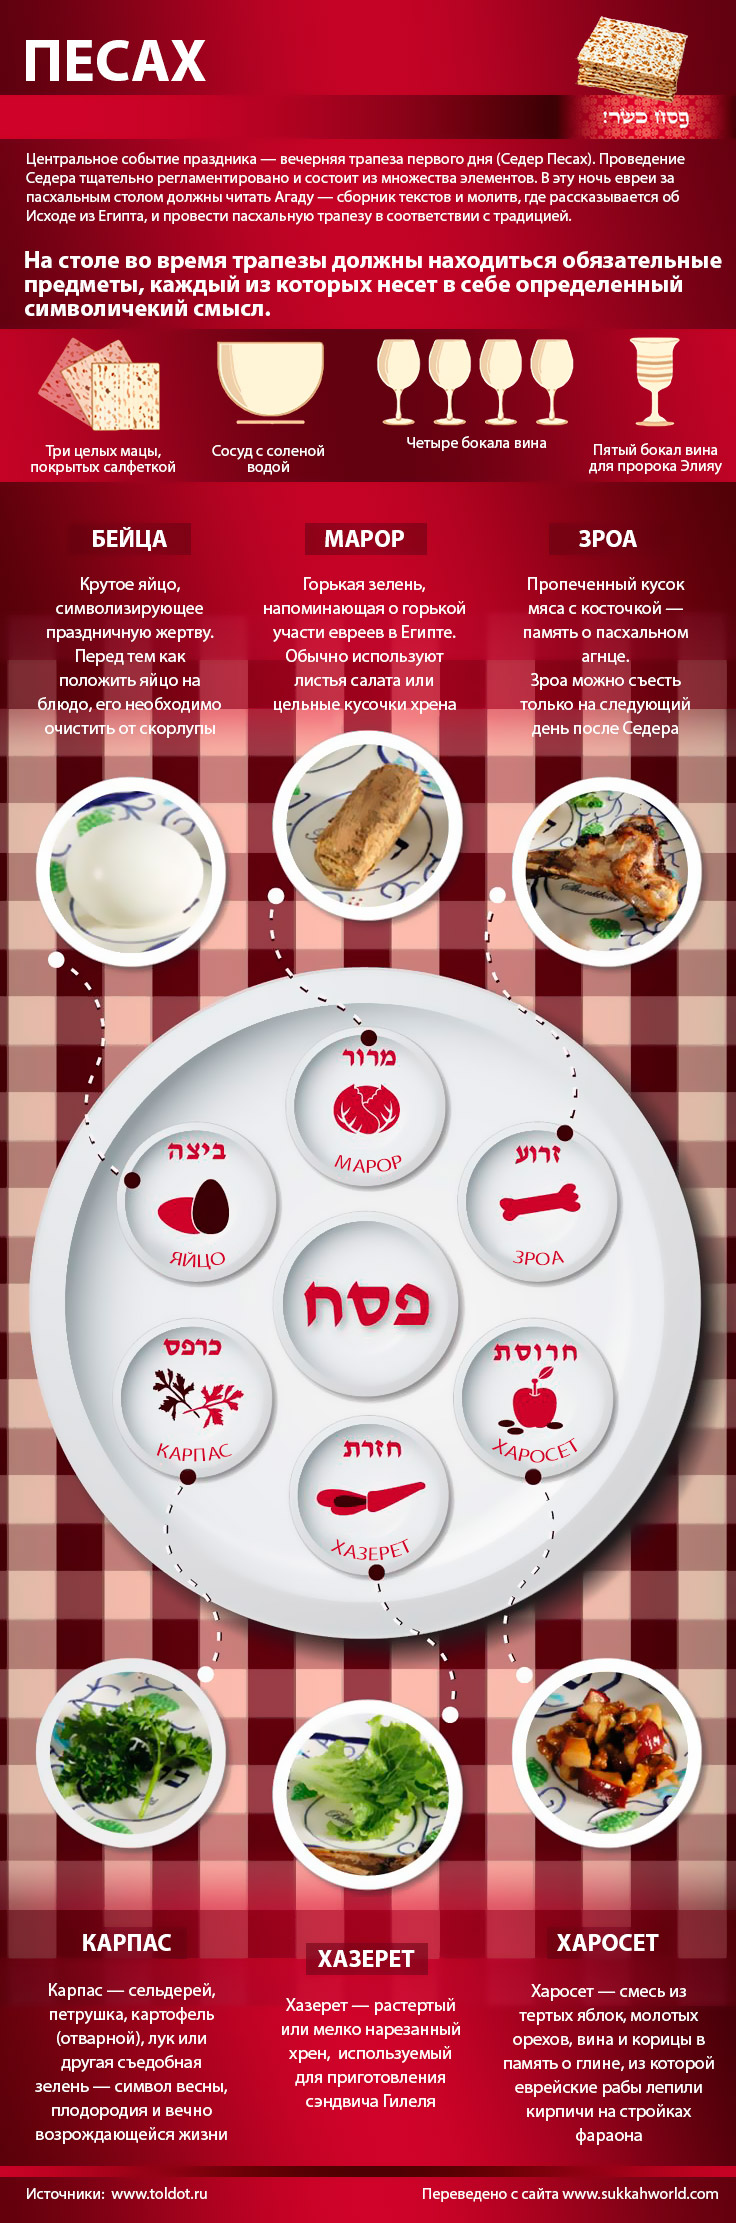 passover_toldot (1)